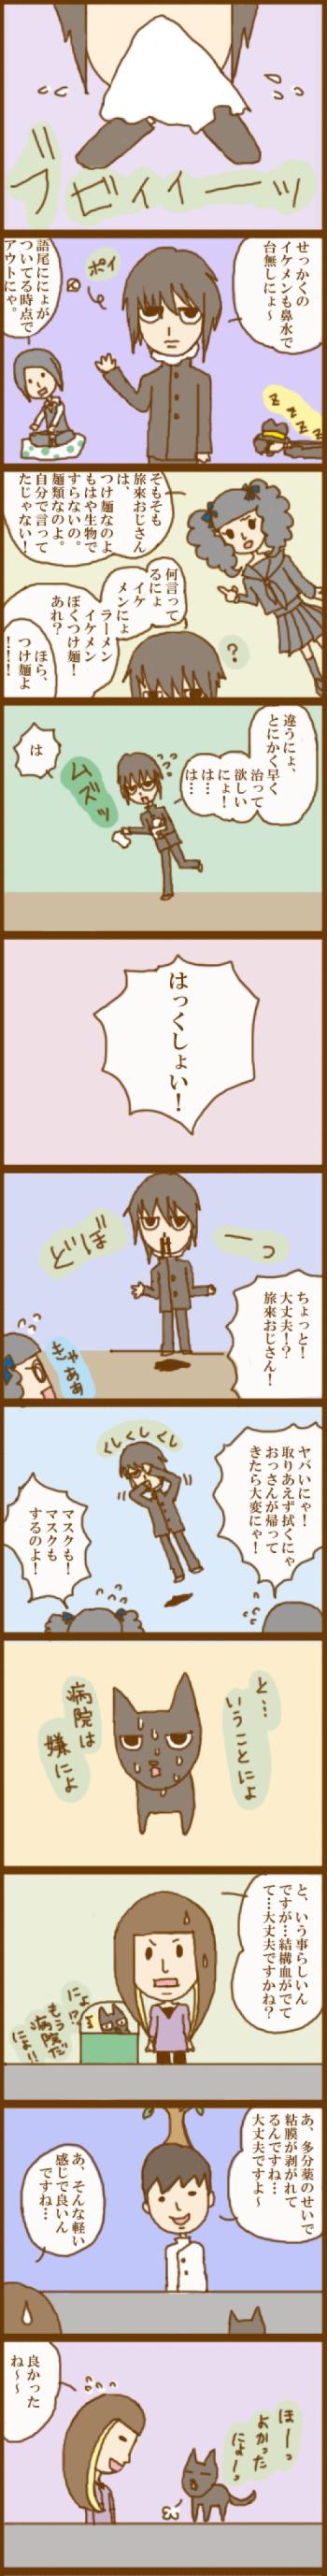 f:id:suzuokayu:20201114180428j:plain